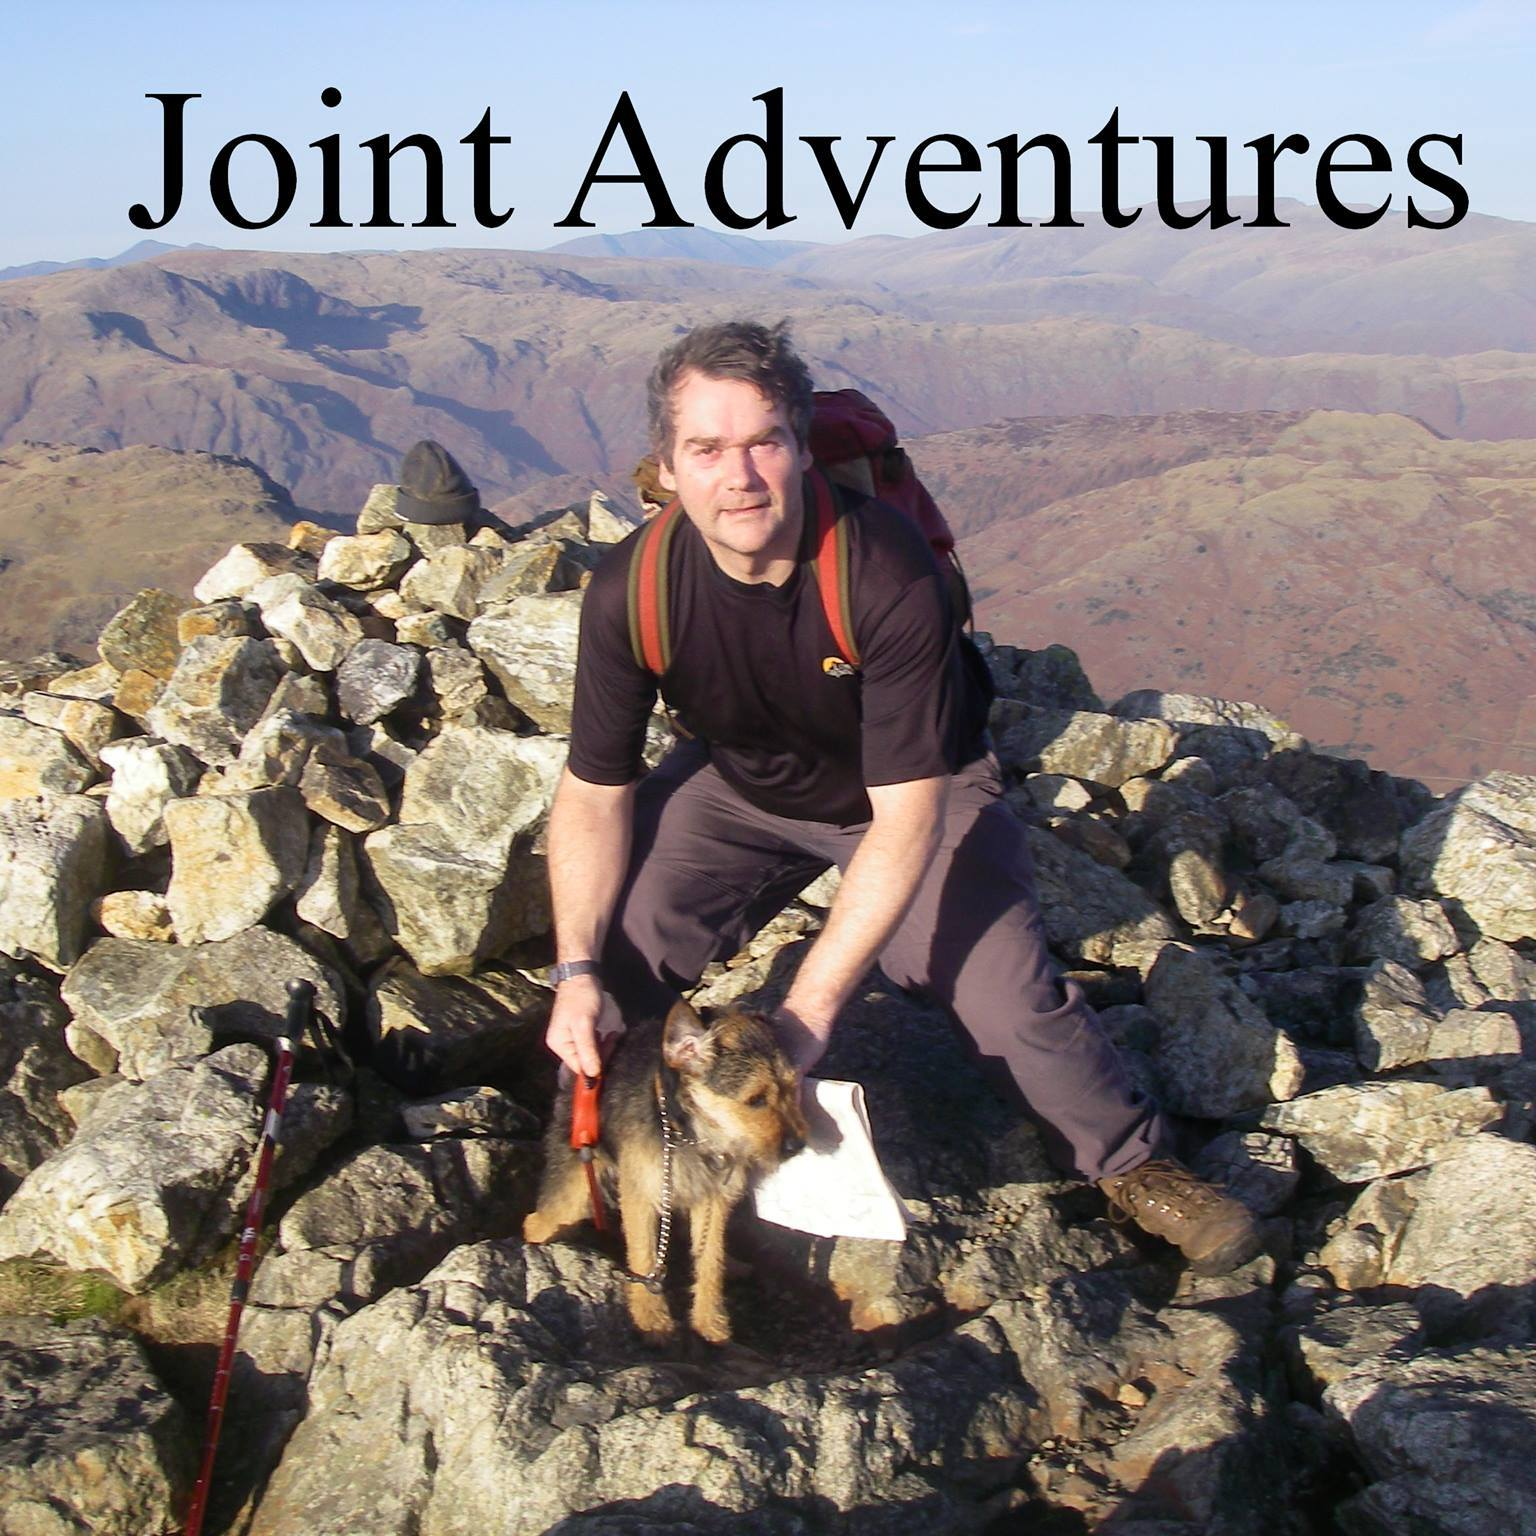 Joint Adventures